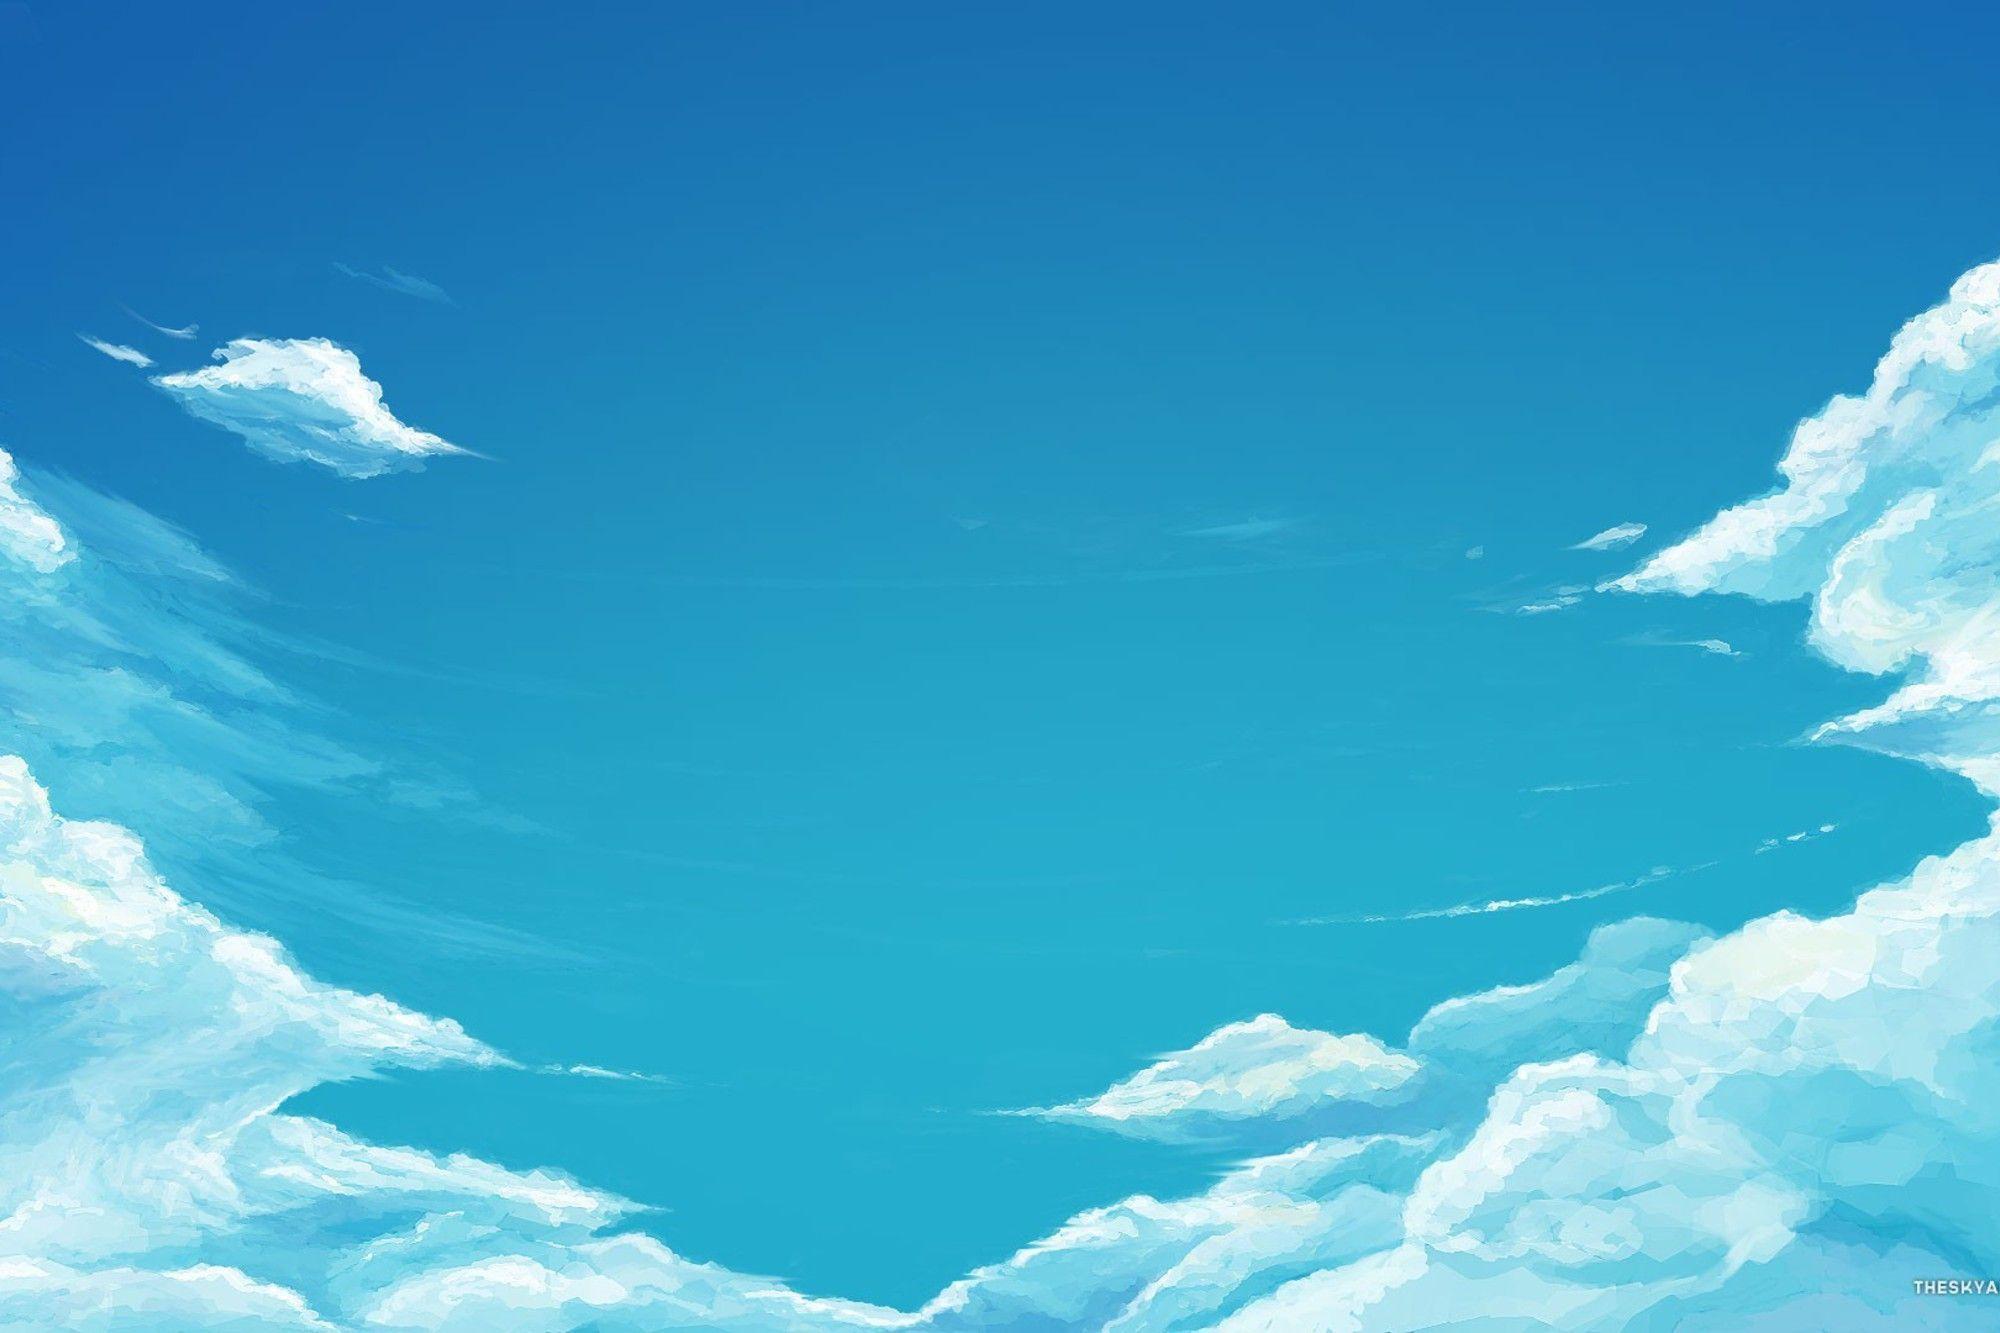 Cartoon Sky Wallpapers Top Free Cartoon Sky Backgrounds Wallpaperaccess